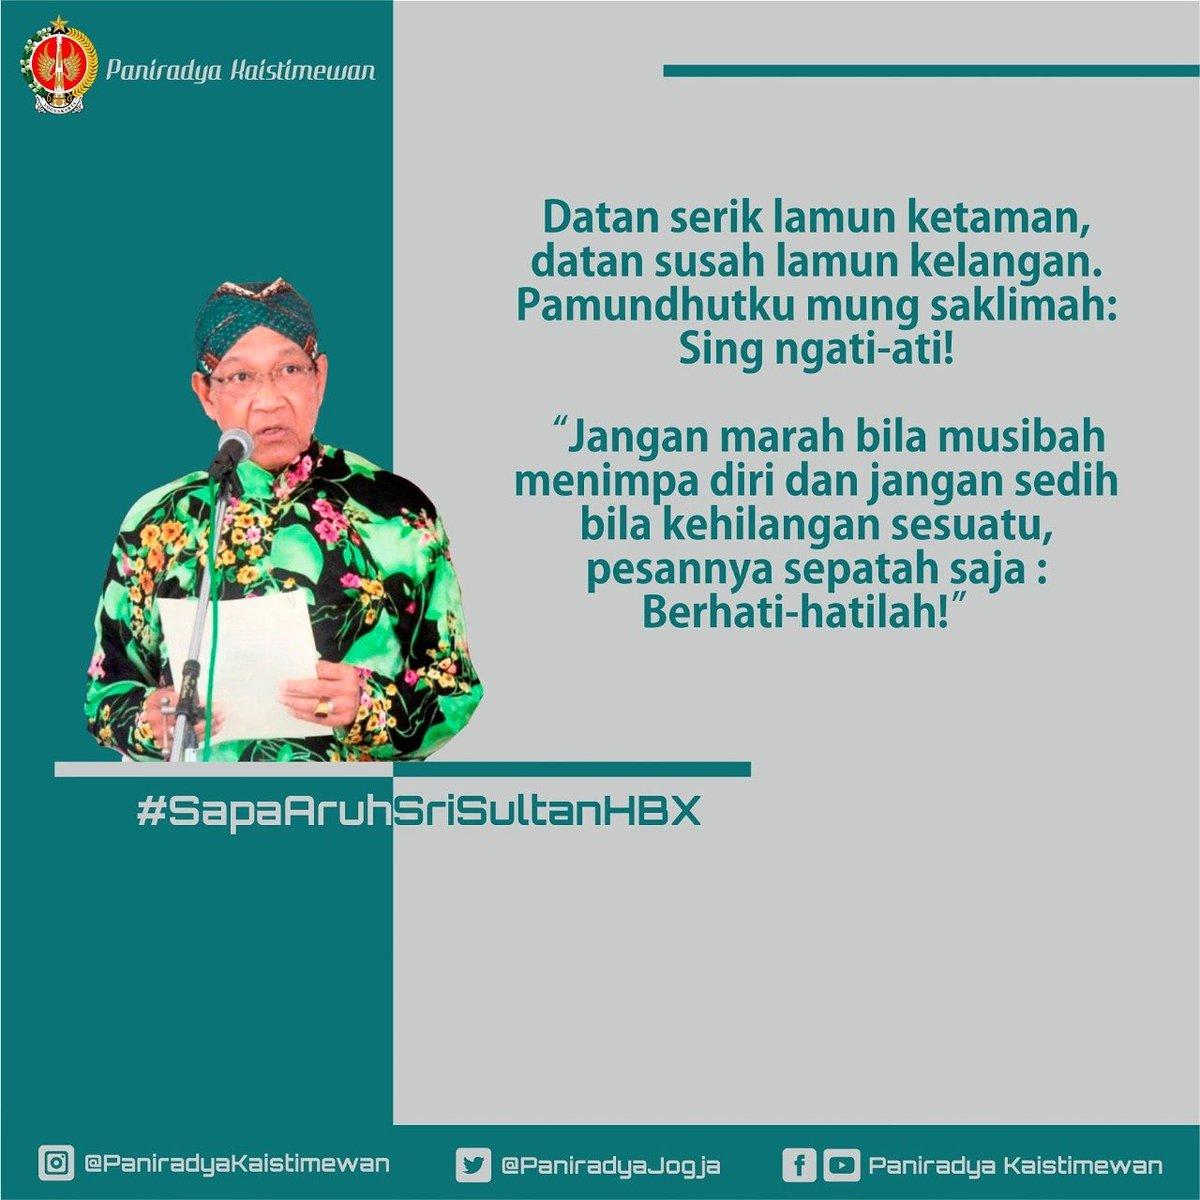 The most advanced Javanese language #JOGJA pic.twitter.com/cTLTXqTSwY